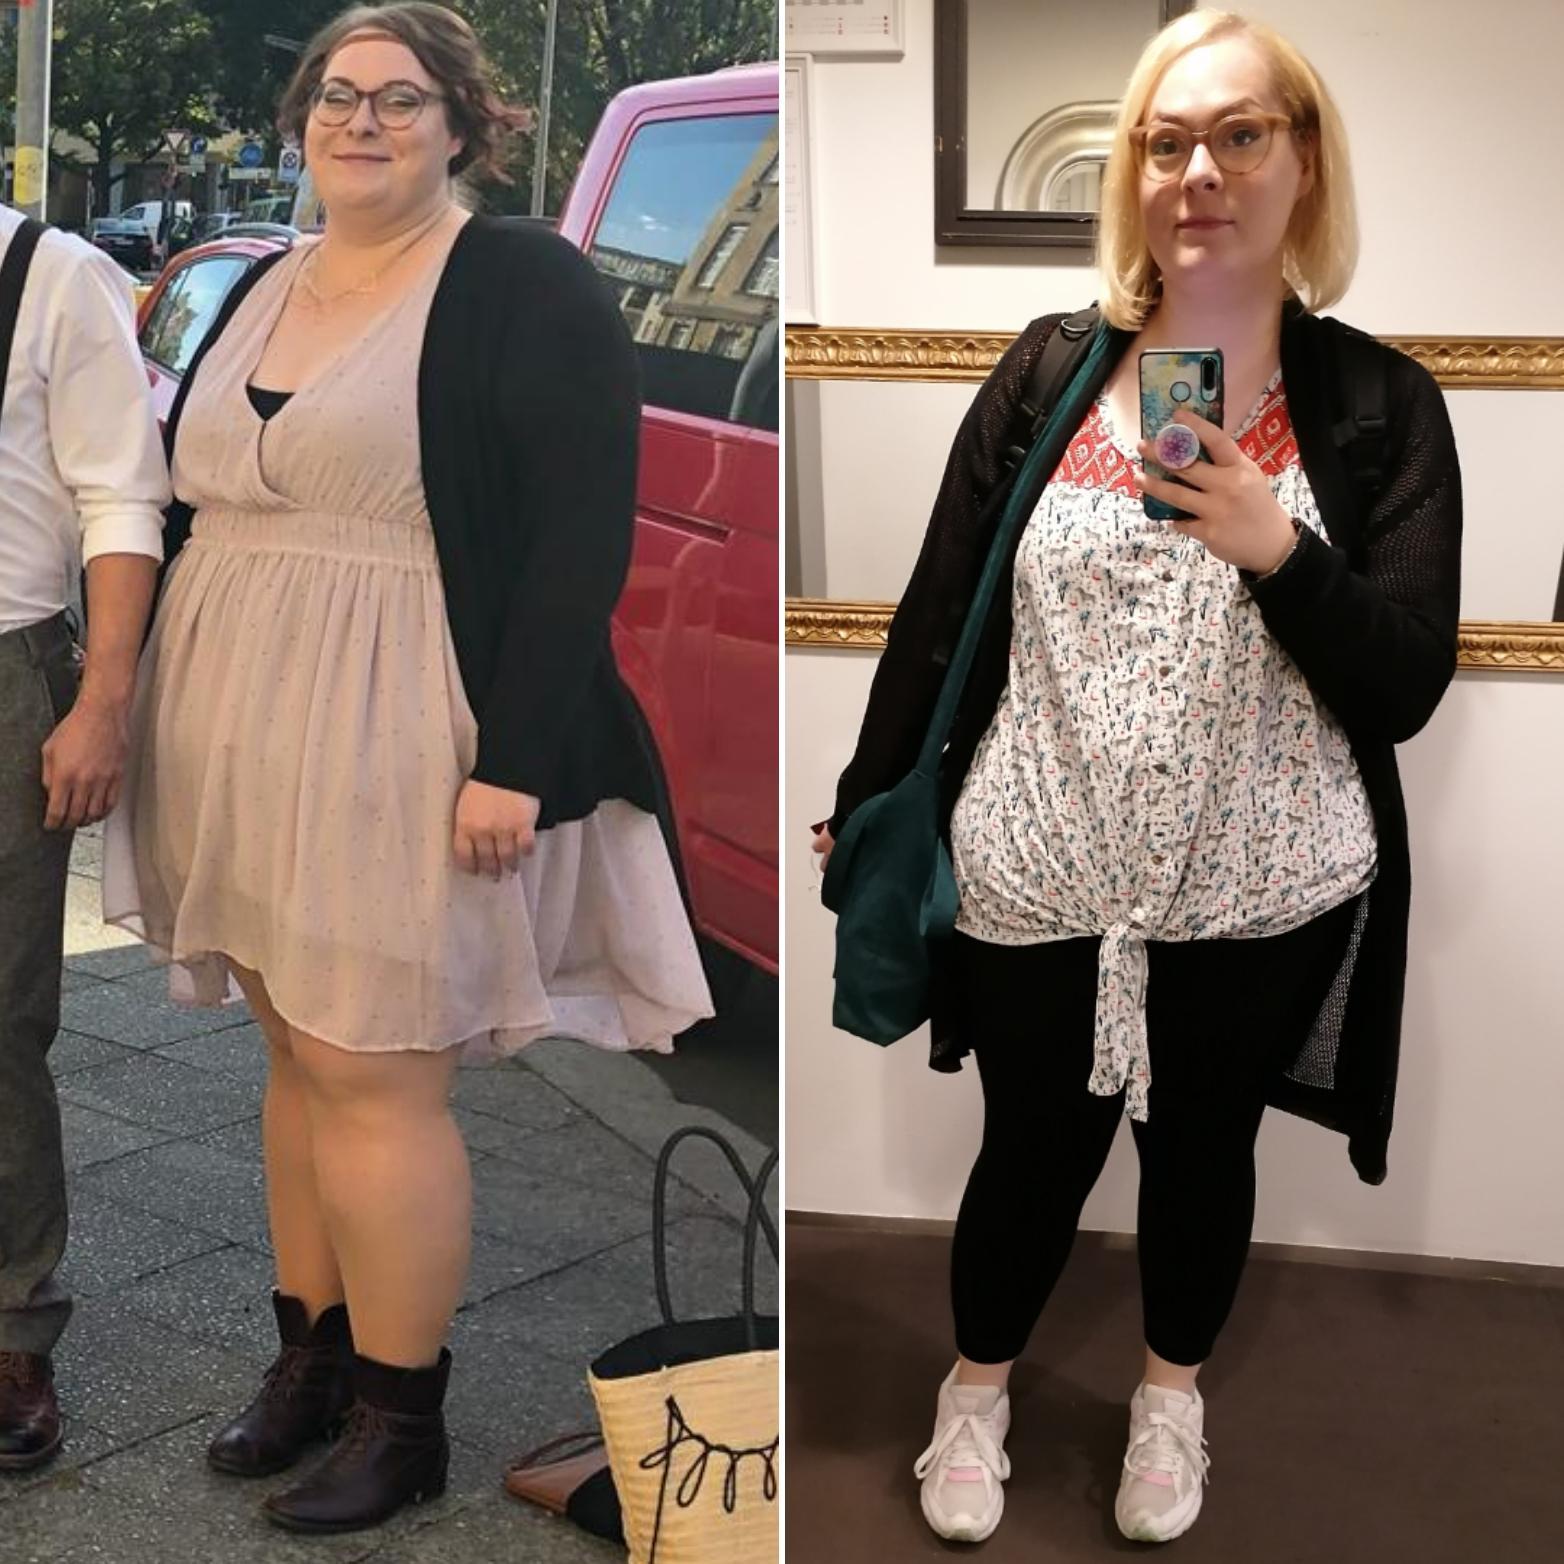 5'8 Female 68 lbs Fat Loss 330 lbs to 262 lbs